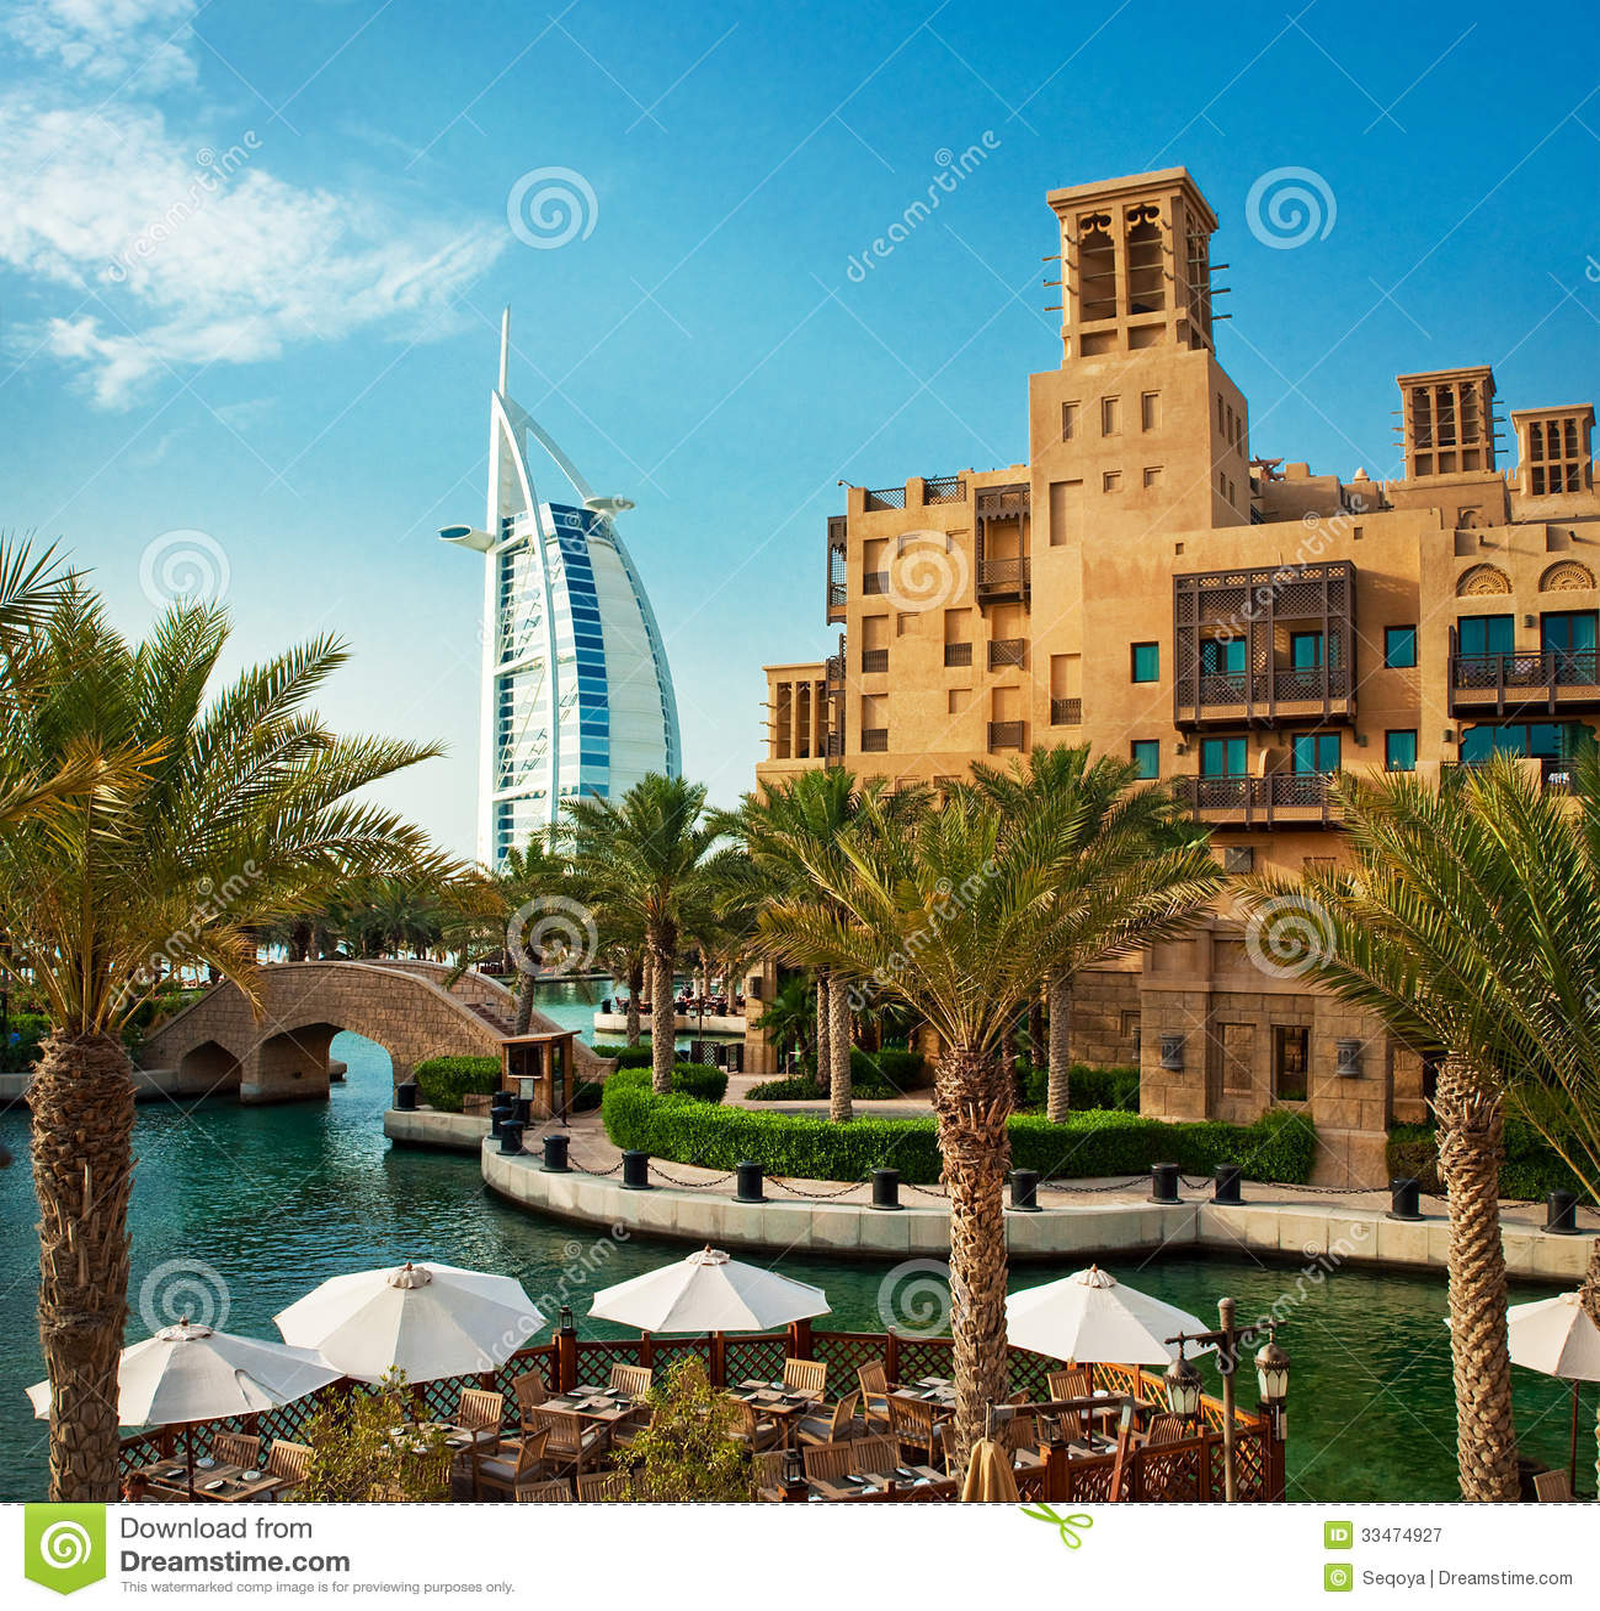 District of madinat jumeirah 3 2013 in dubai editorial for Hotel dubai famous